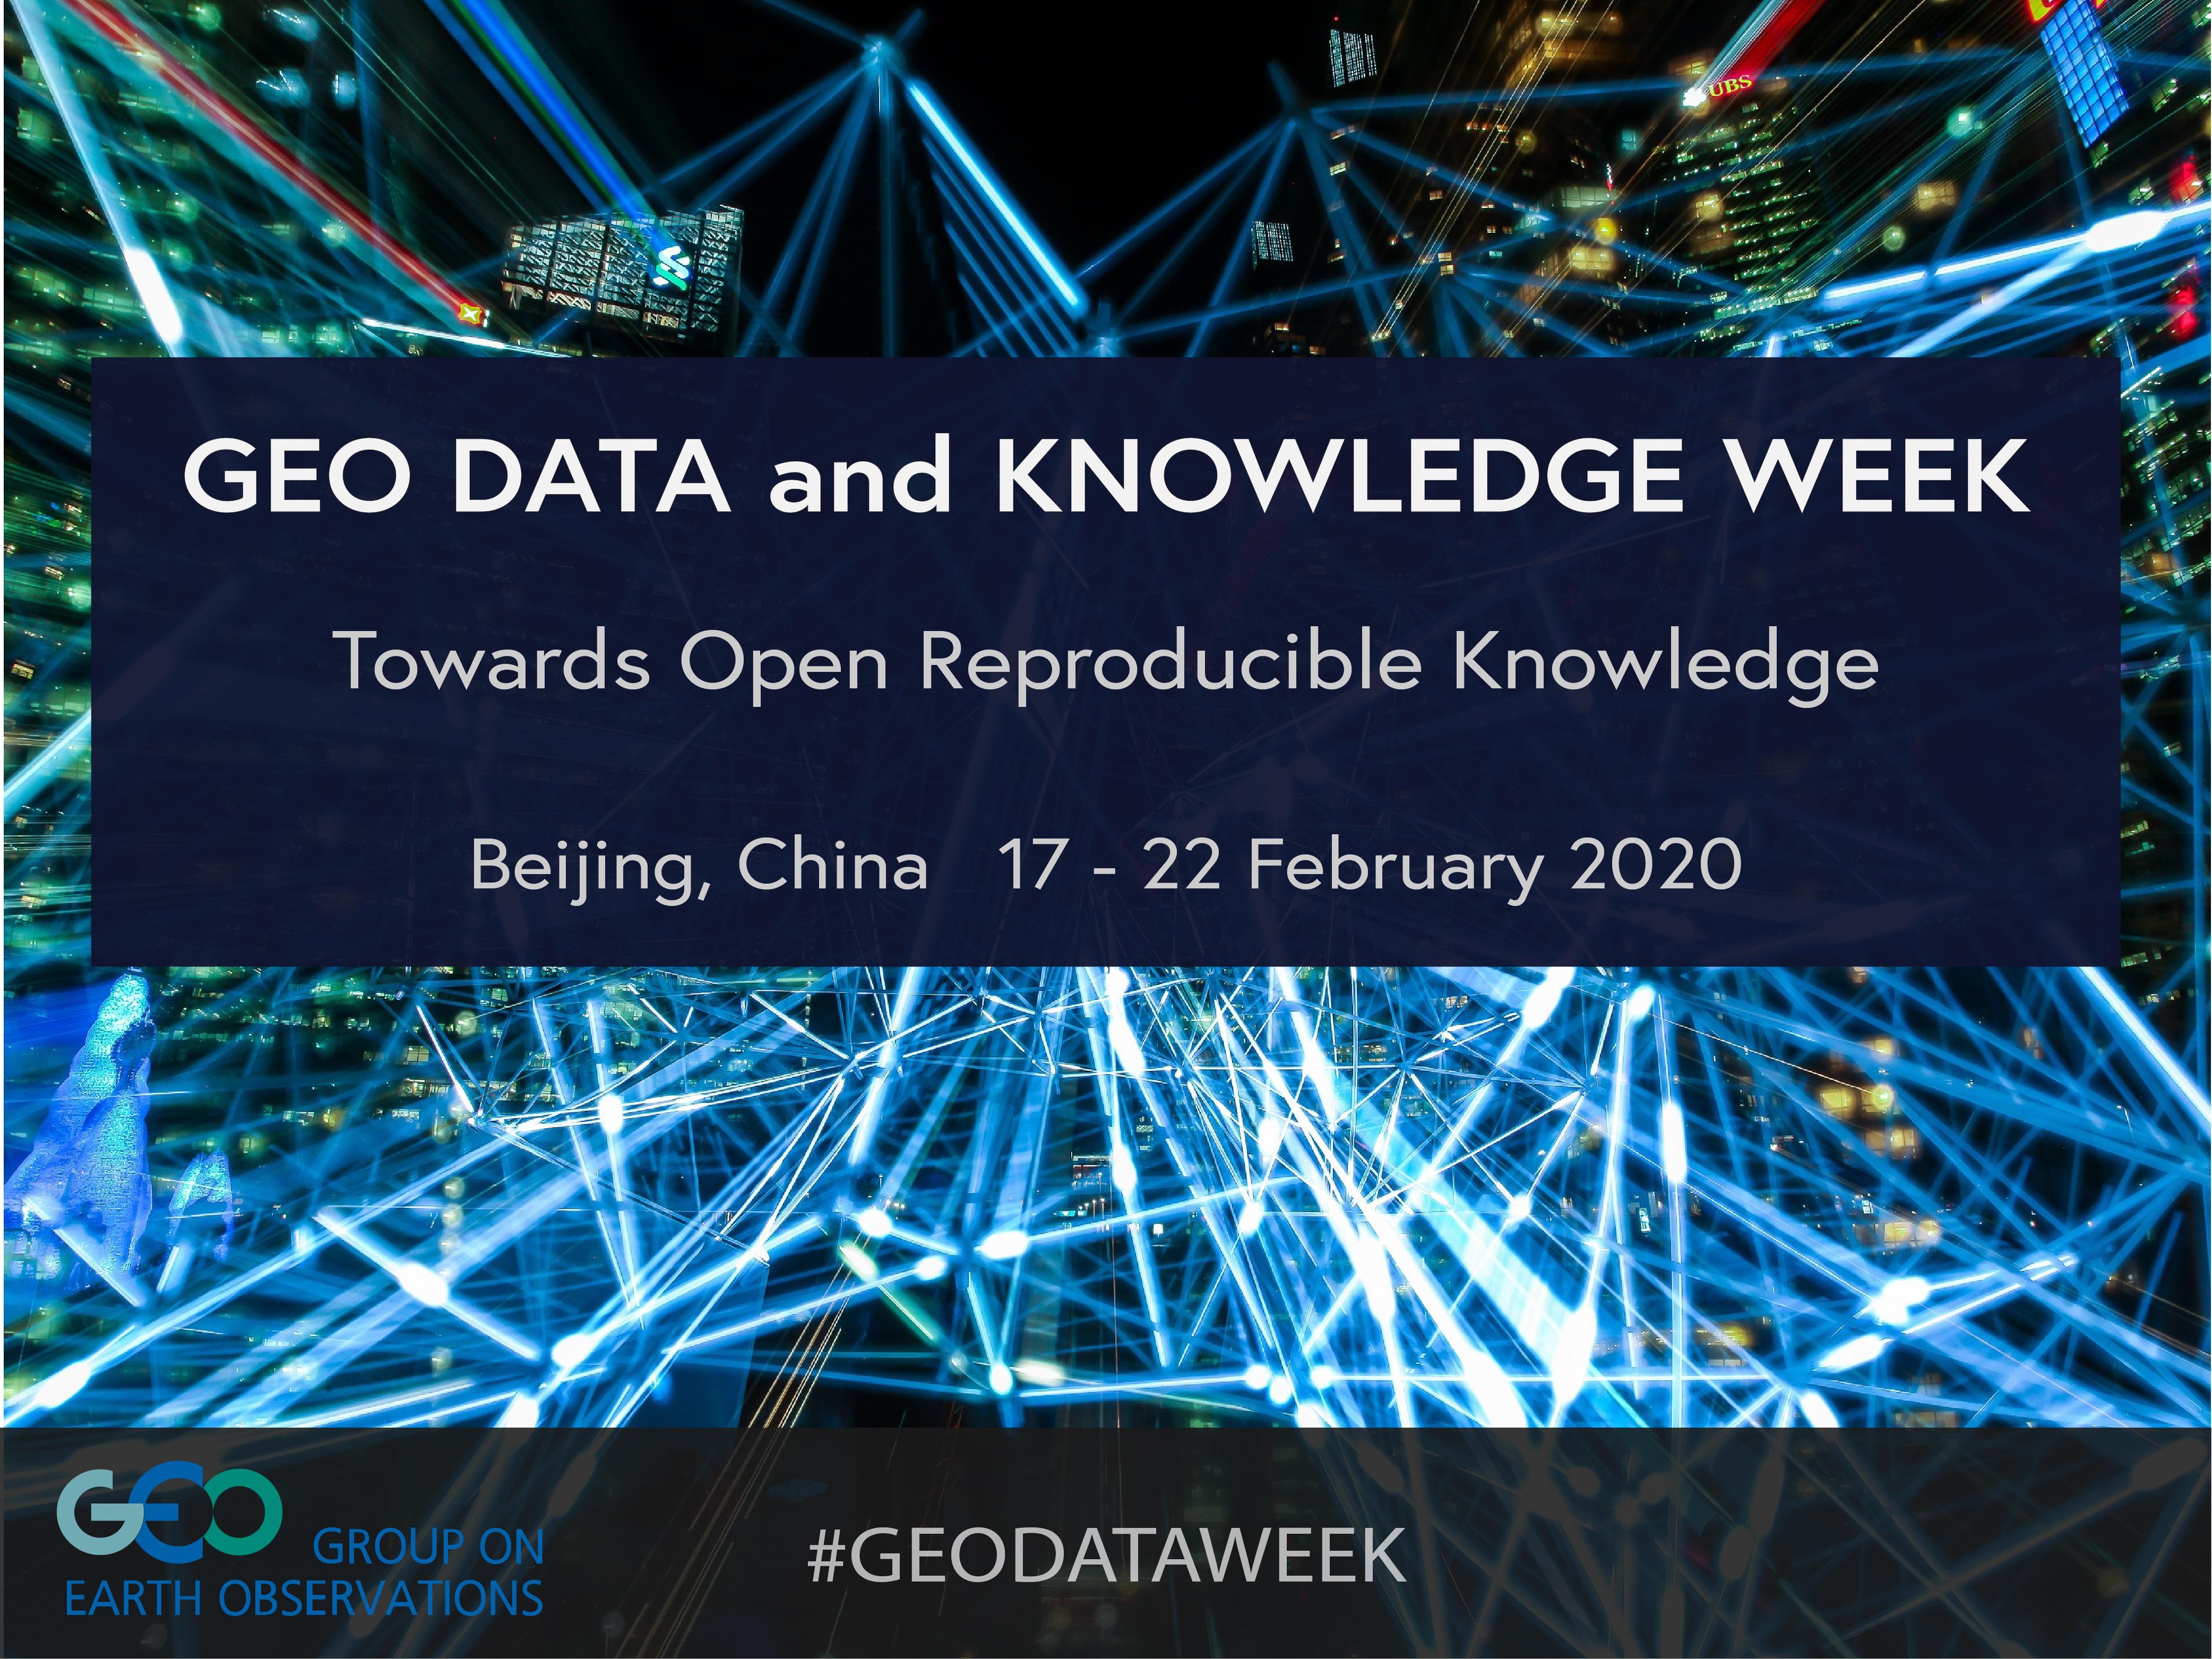 La Events February 2020.Geo Data And Knowledge Week